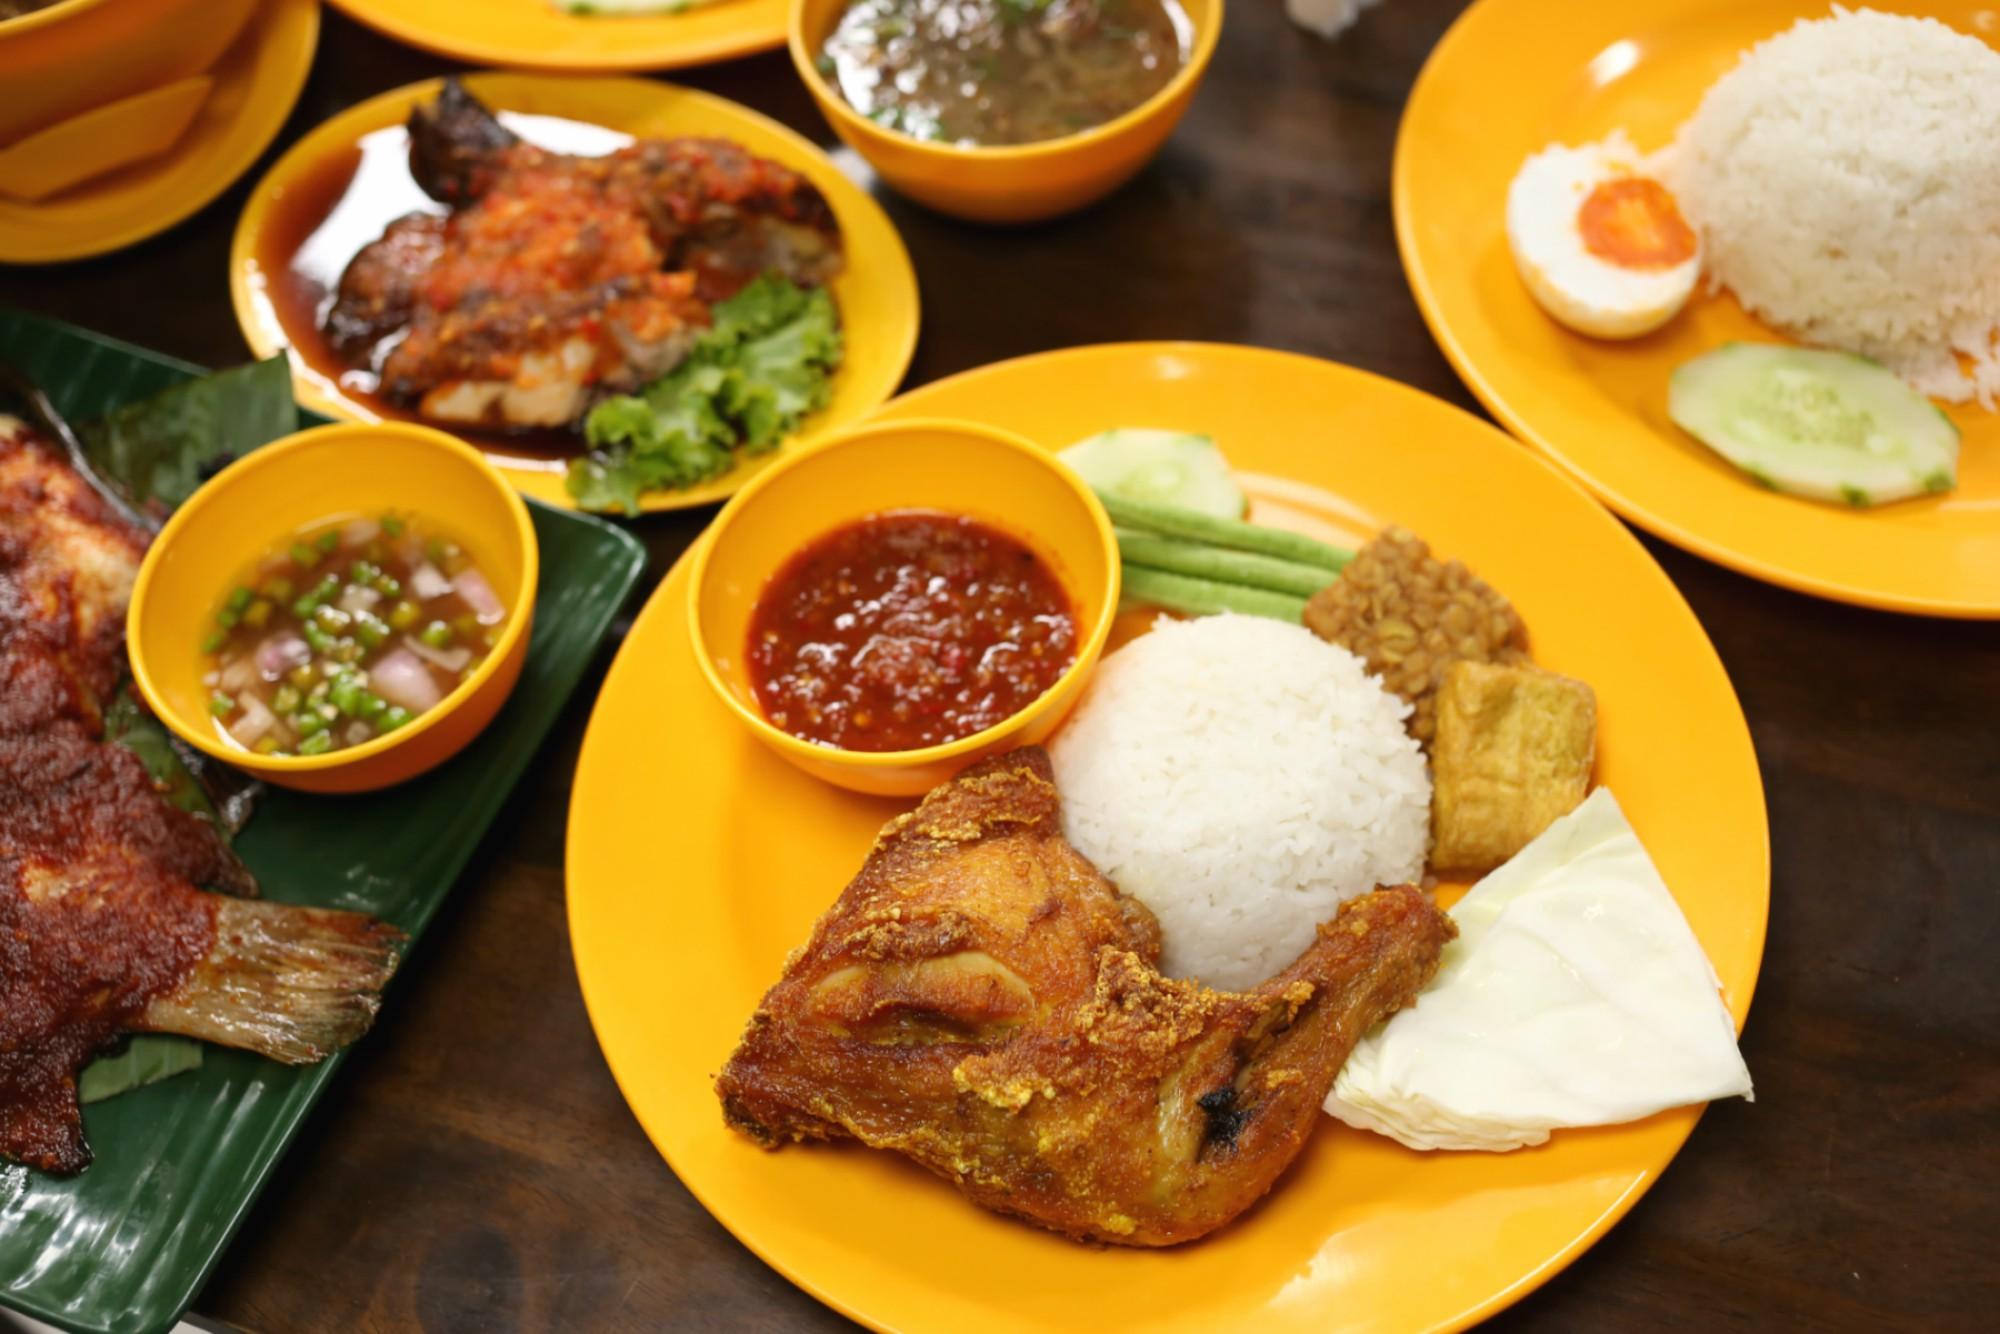 jalan jalan cari makan  picks Resepi Nasi Goreng Sotong Kering Enak dan Mudah